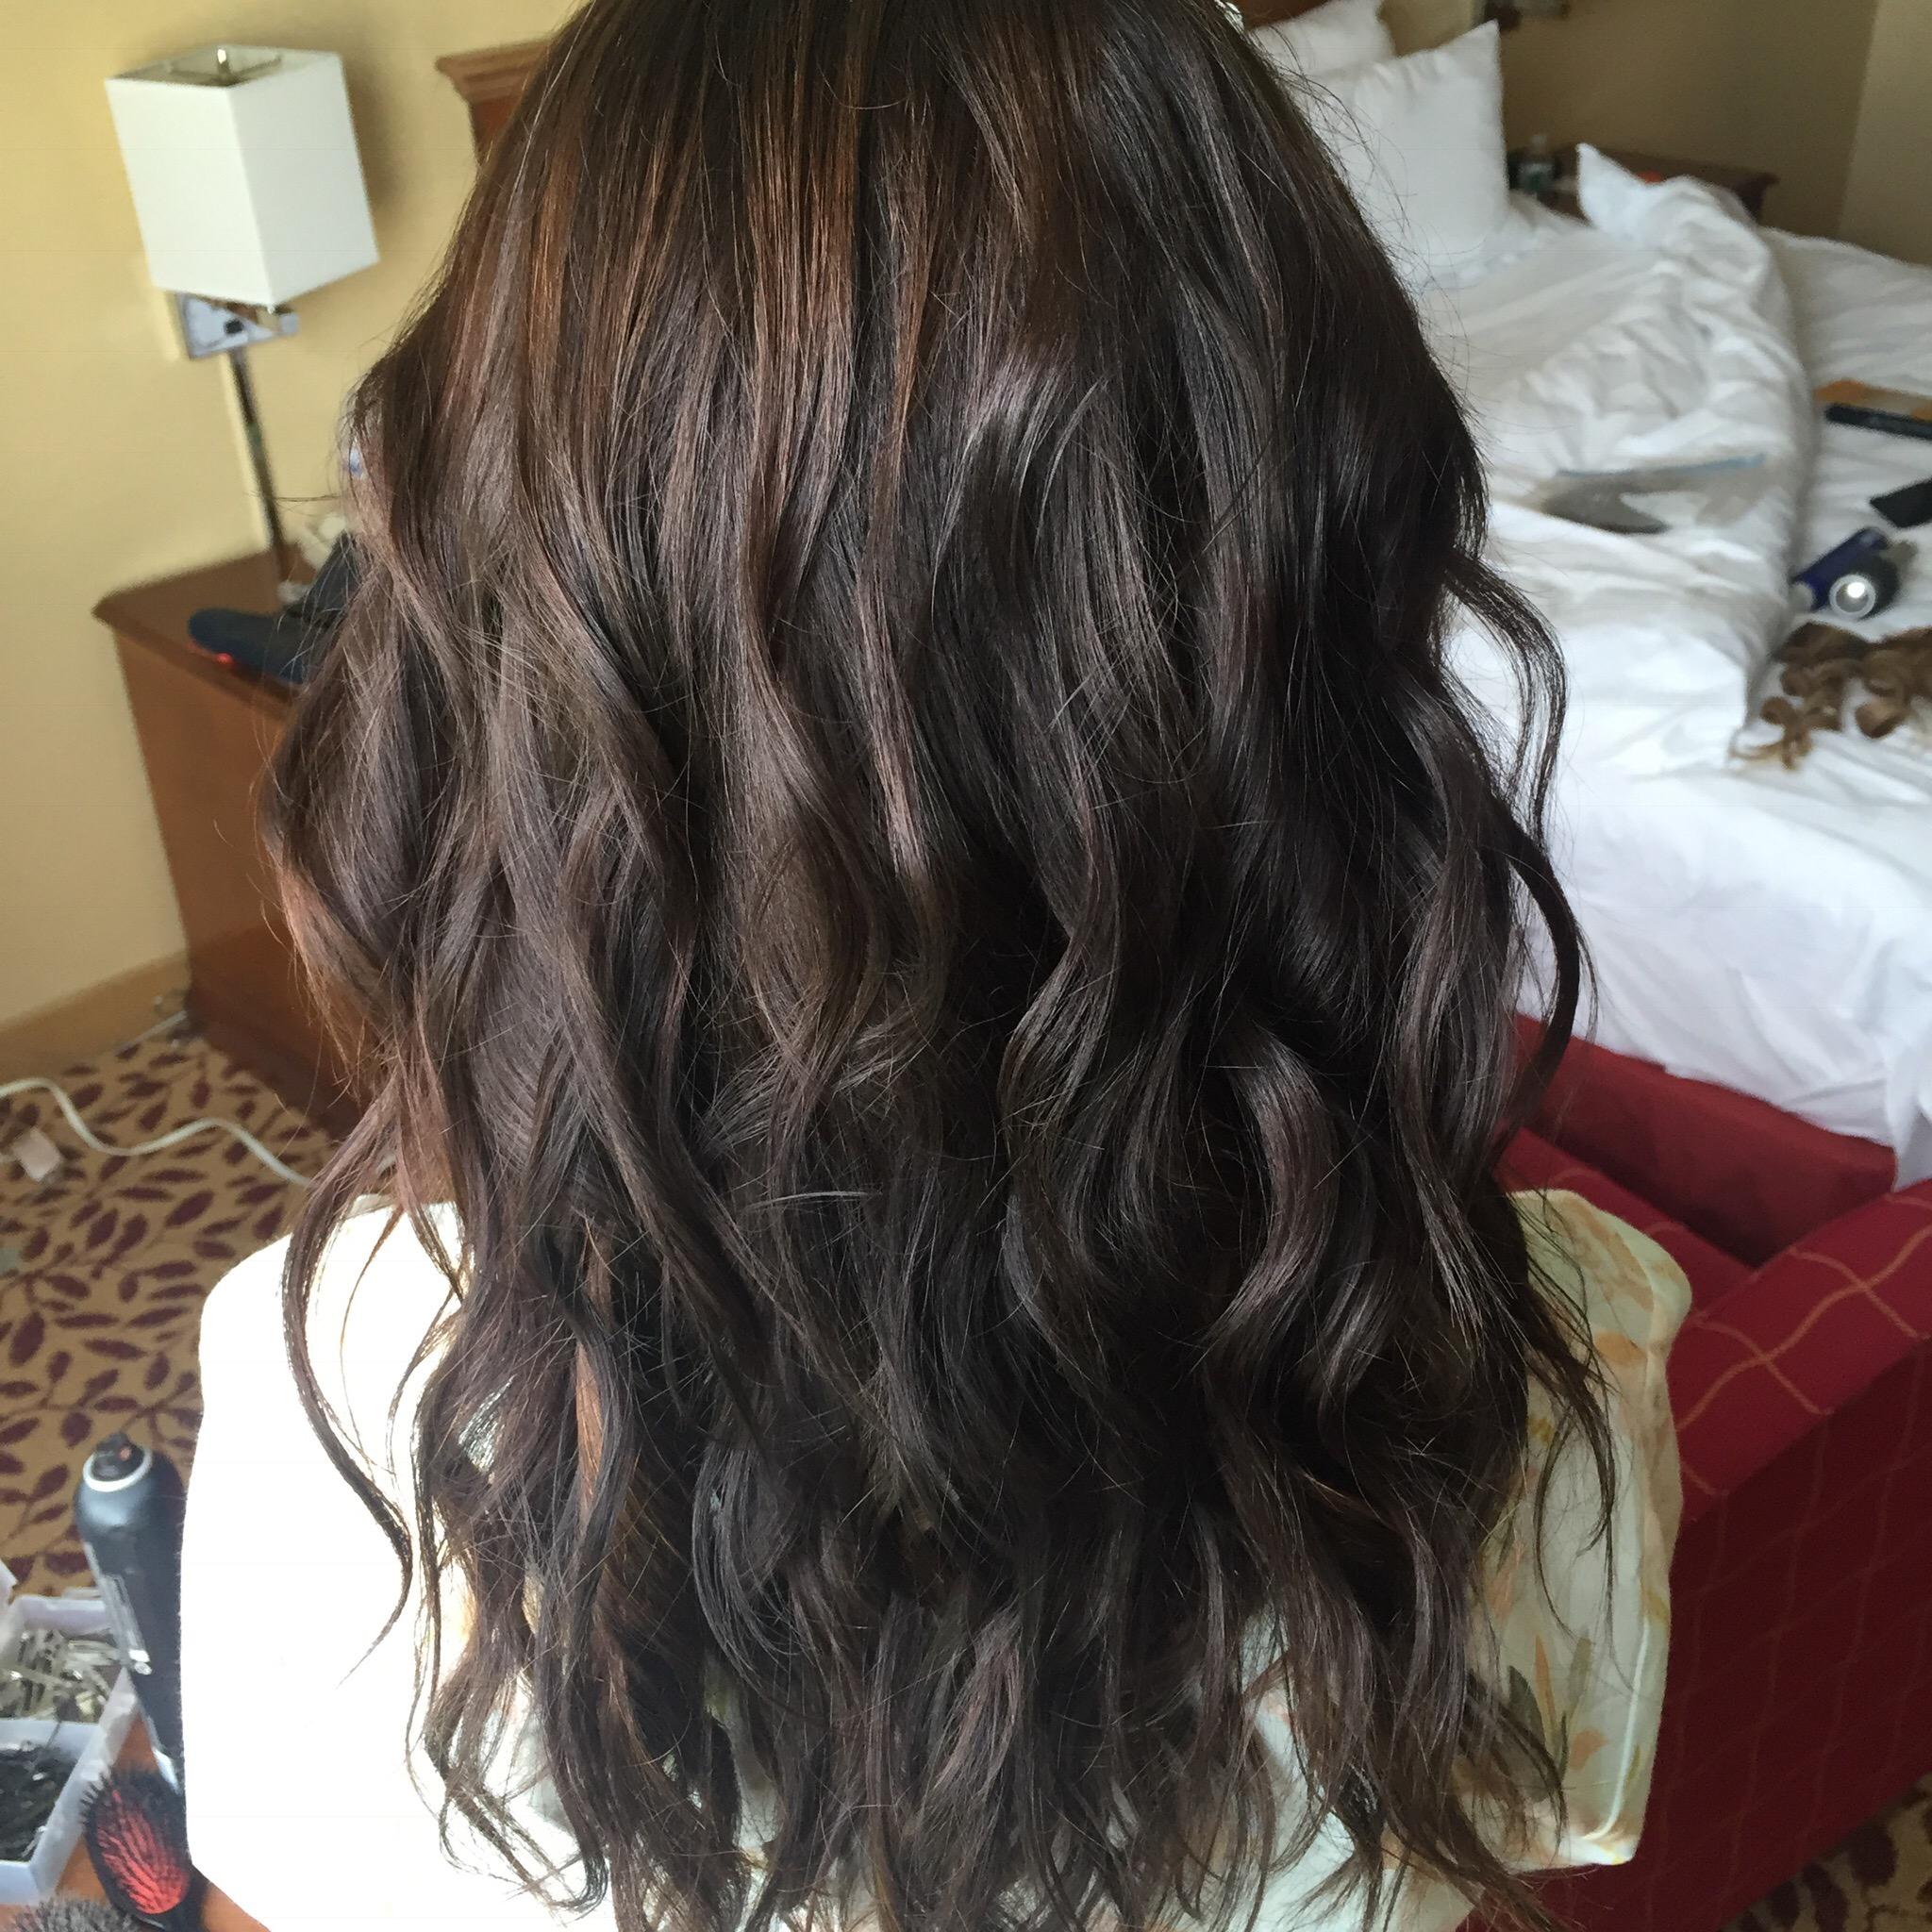 jeannine-morris-hair